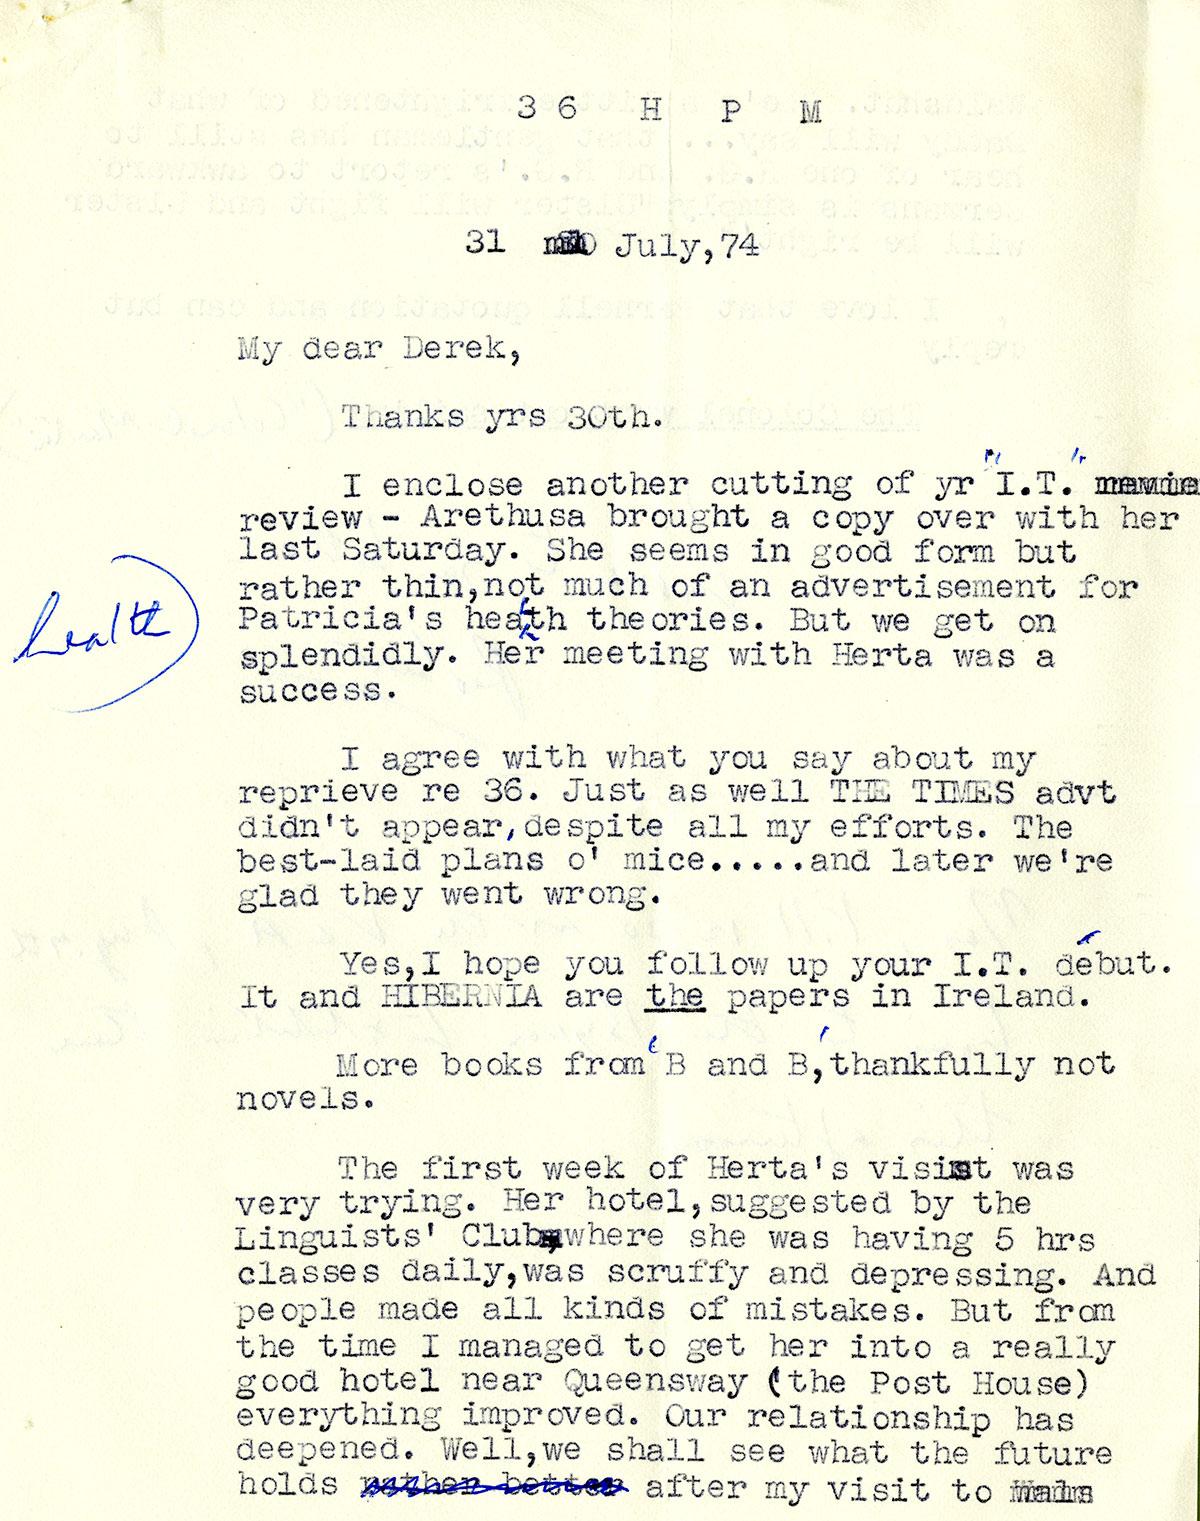 GreacenStanford001 Letters to Stanford Greacen Estate 1970 ...